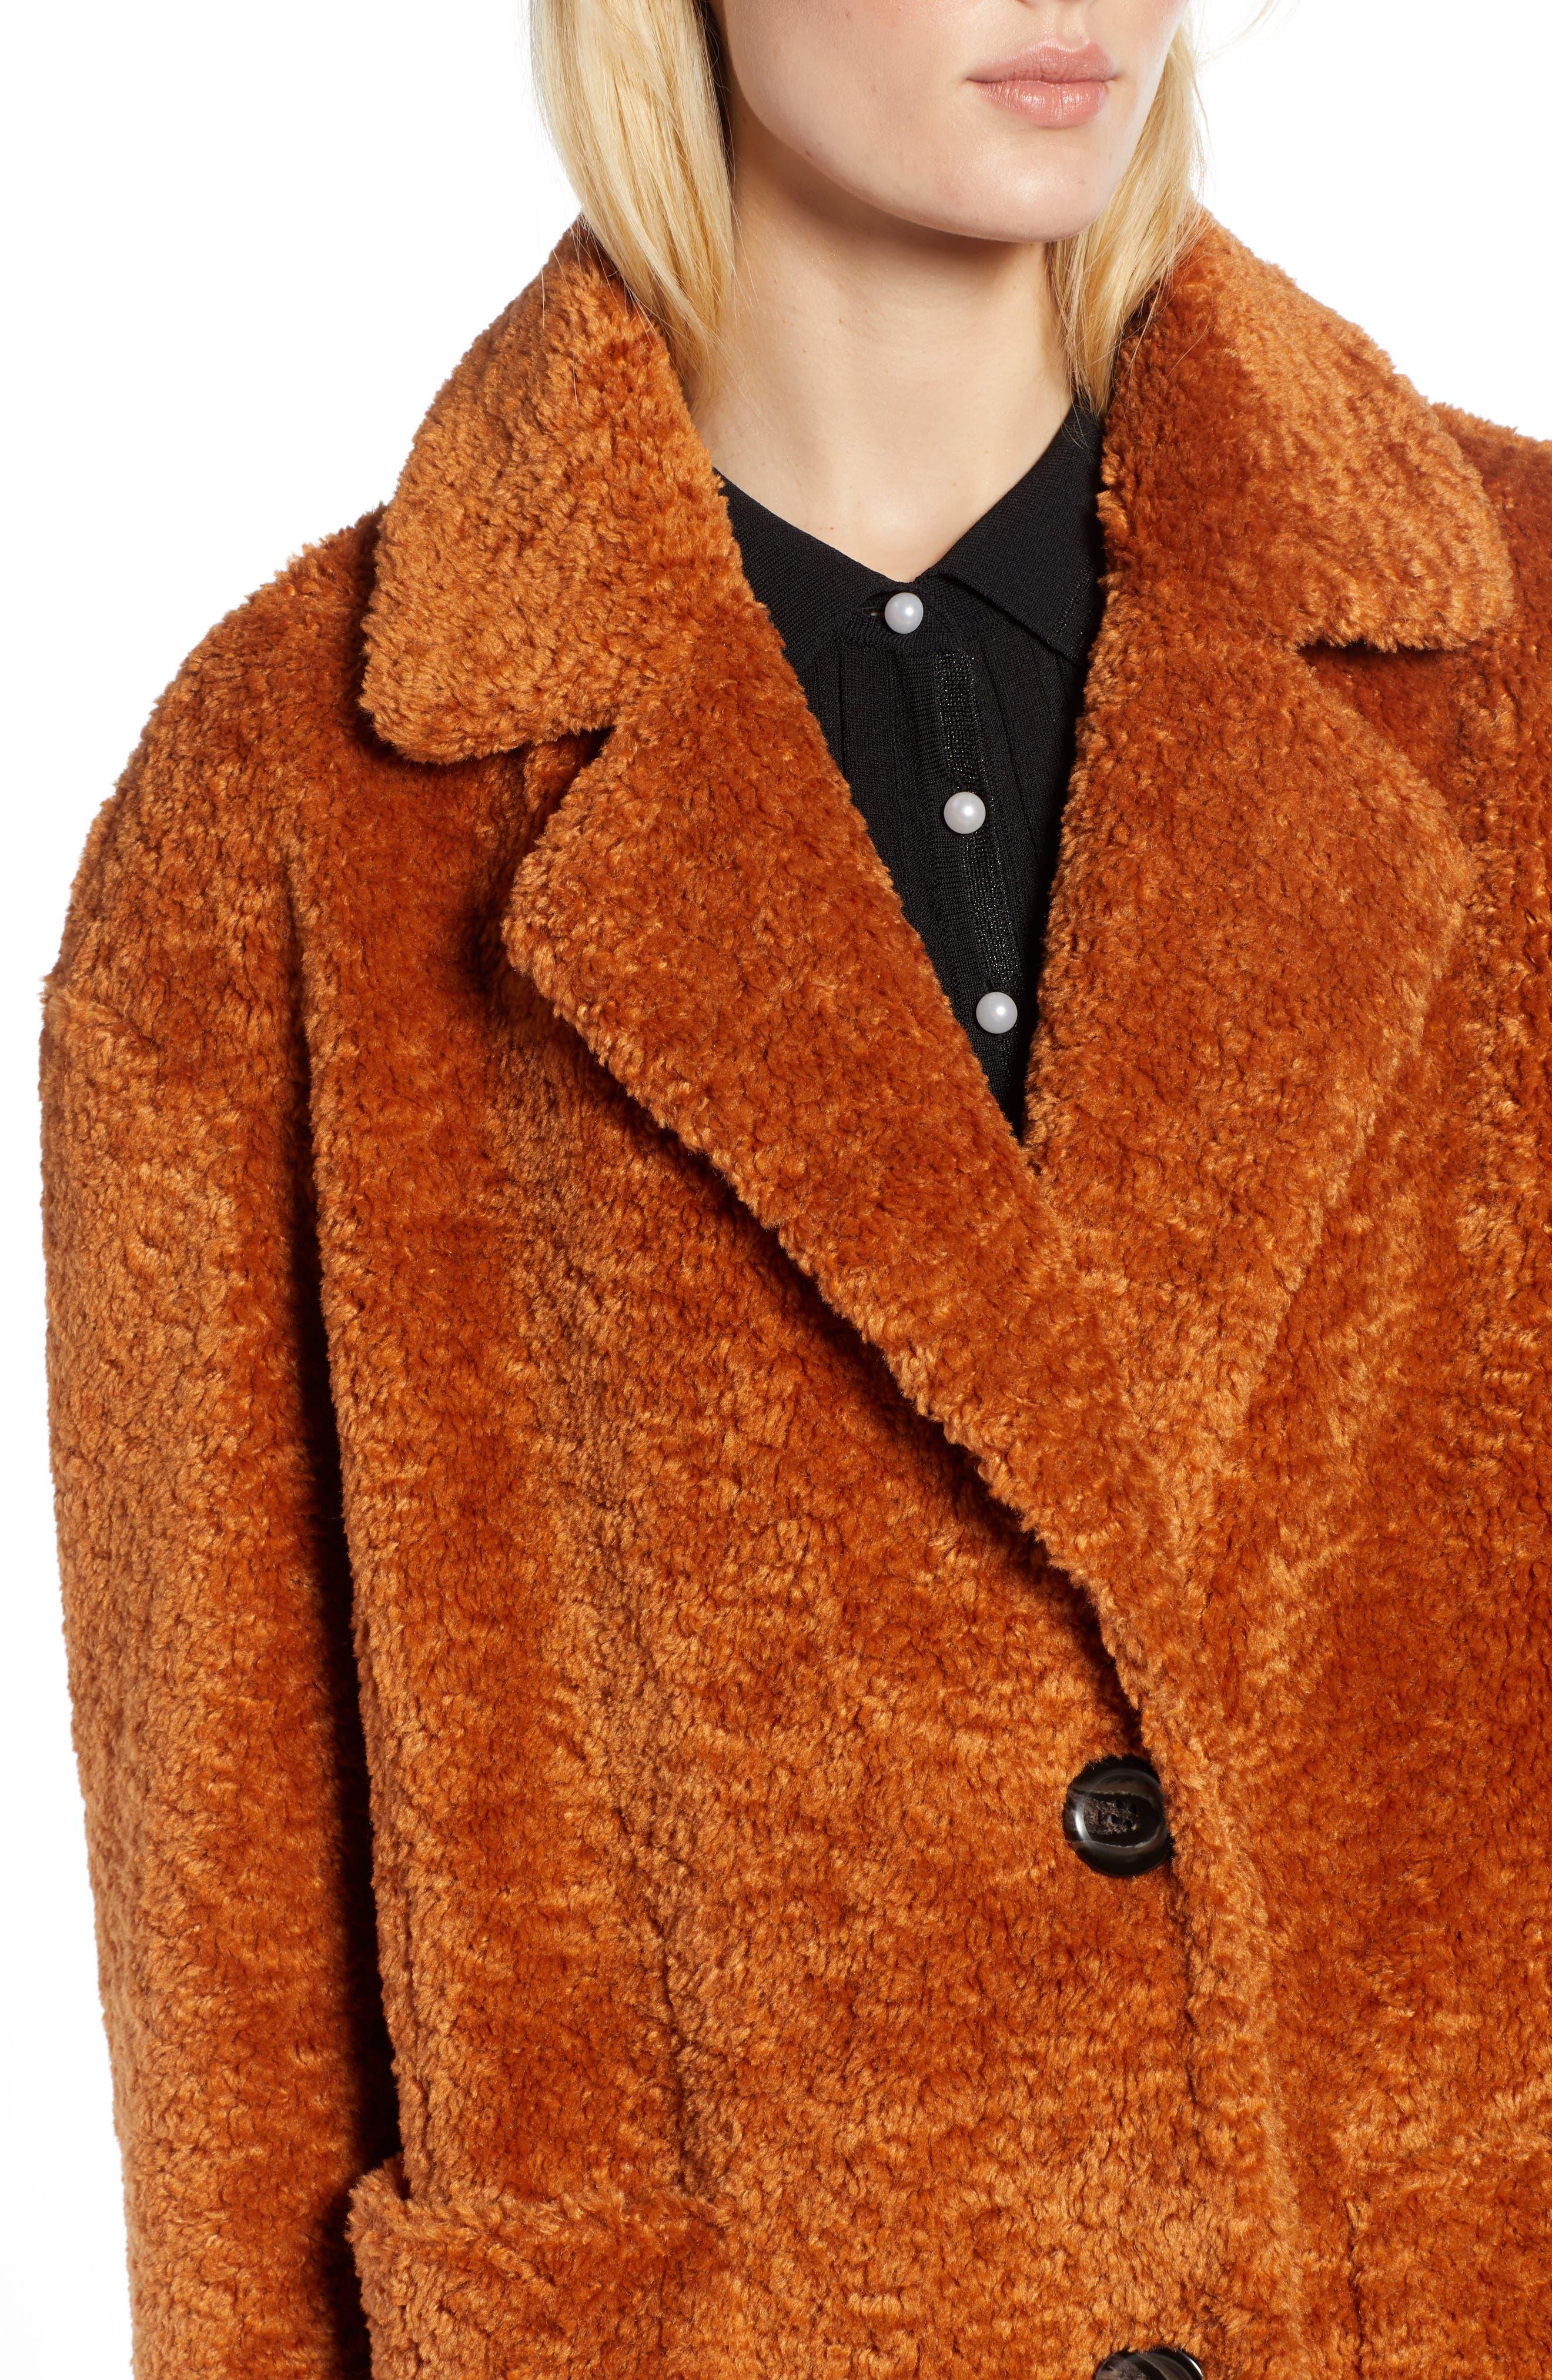 x Atlantic-Pacific Faux Fur Coat,                             Alternate thumbnail 4, color,                             RUST GINGER